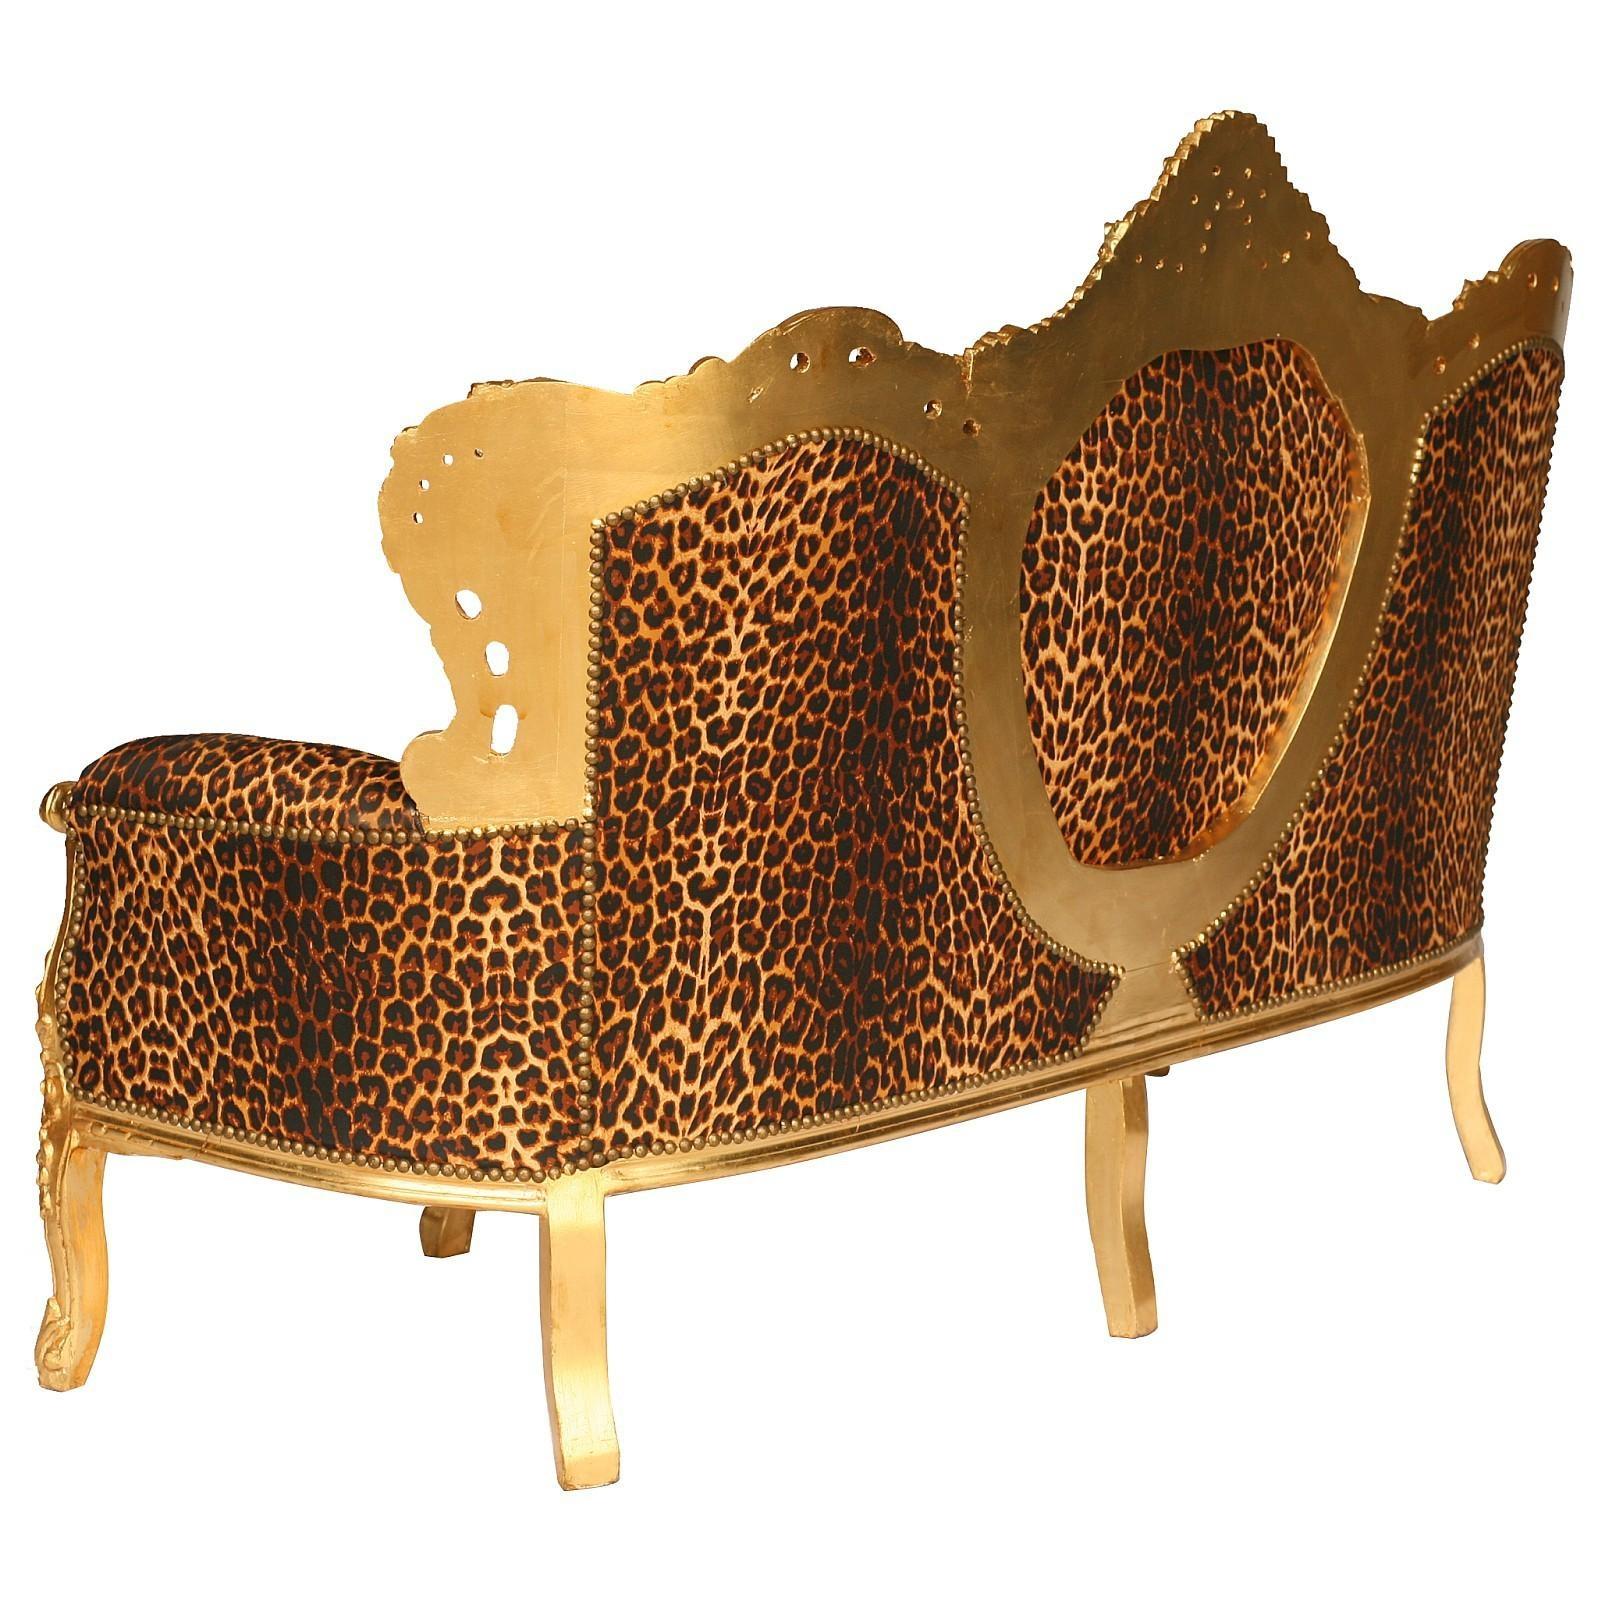 Leopard Sofa Animal Print Microsuede Sofa Slipcover Overstock In Animal Print Sofas (Image 10 of 20)